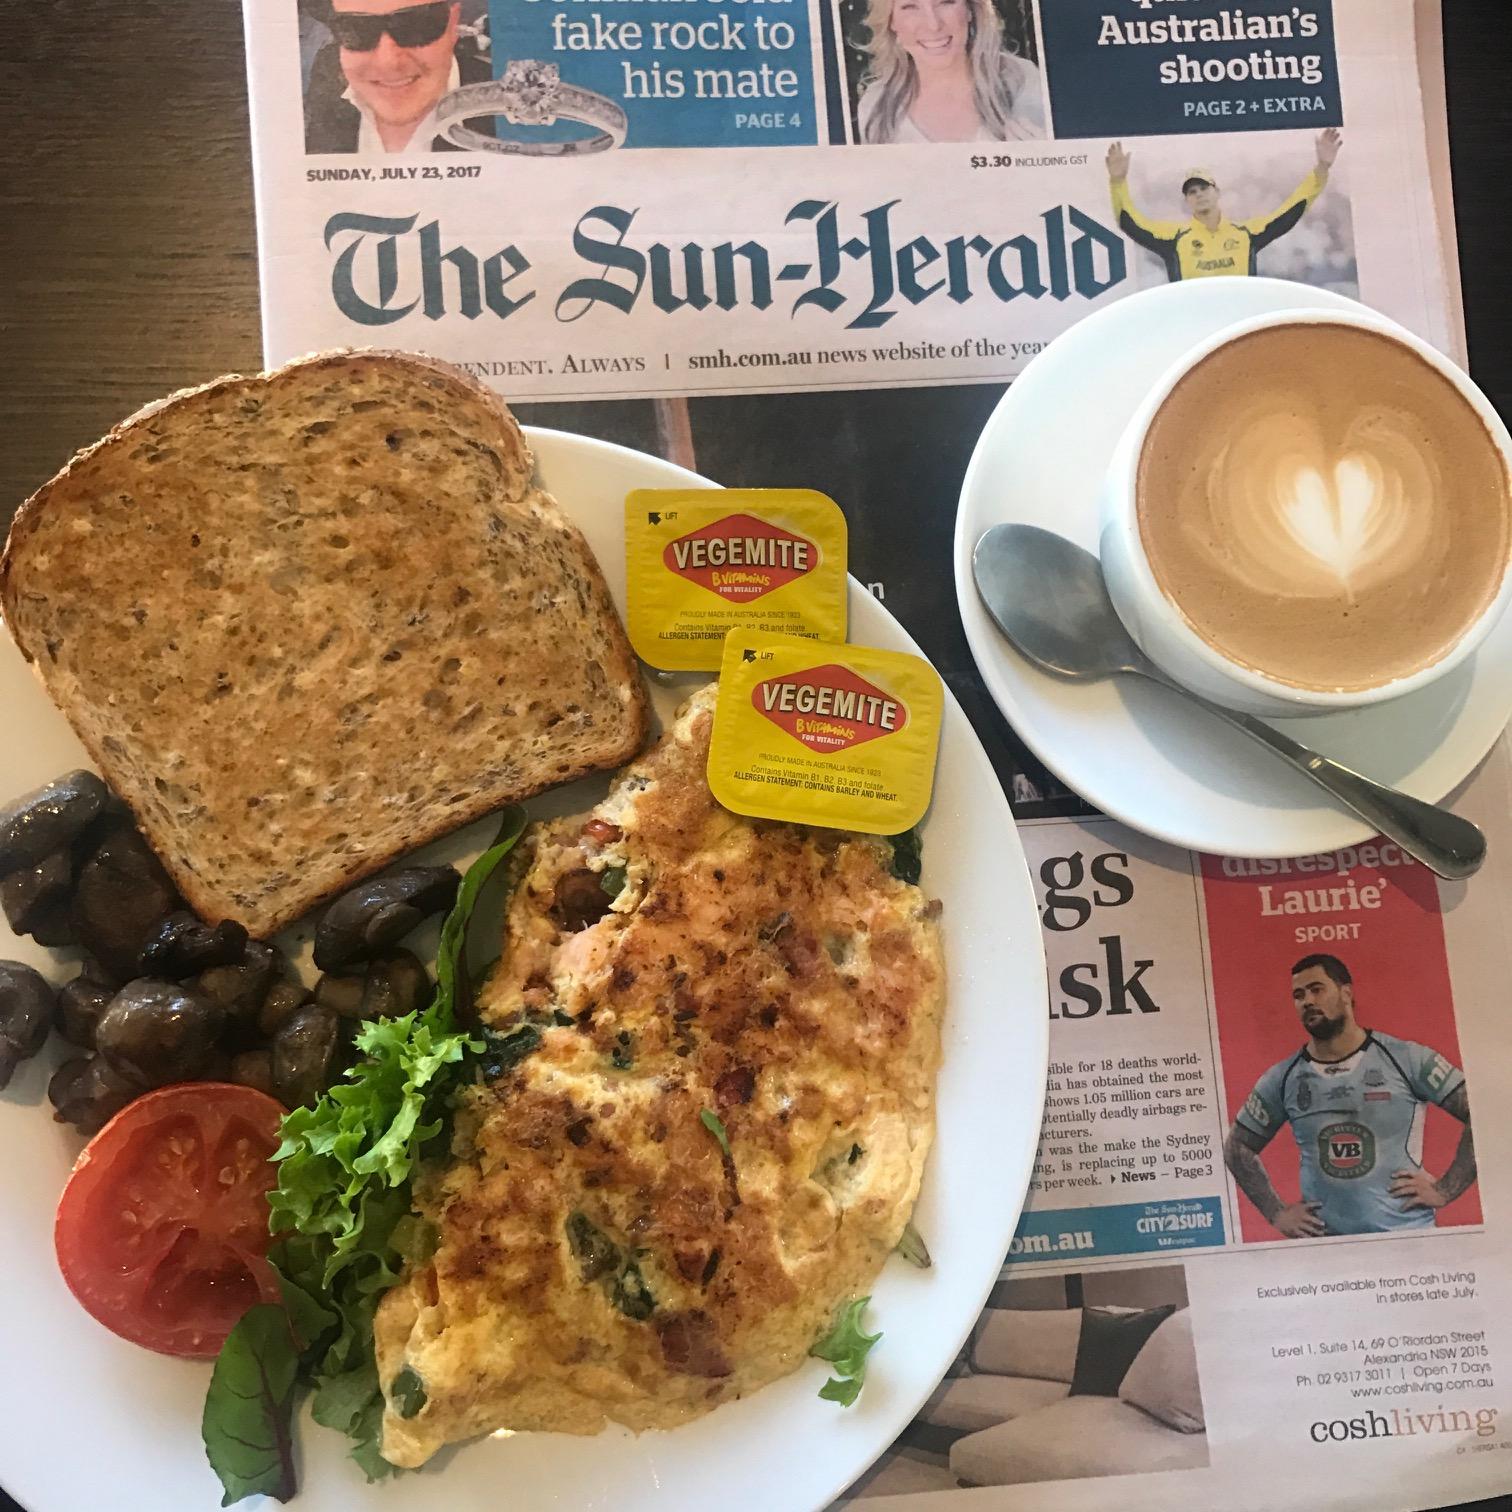 crowne plaza canberra breakfast annakooiman.com travel australia